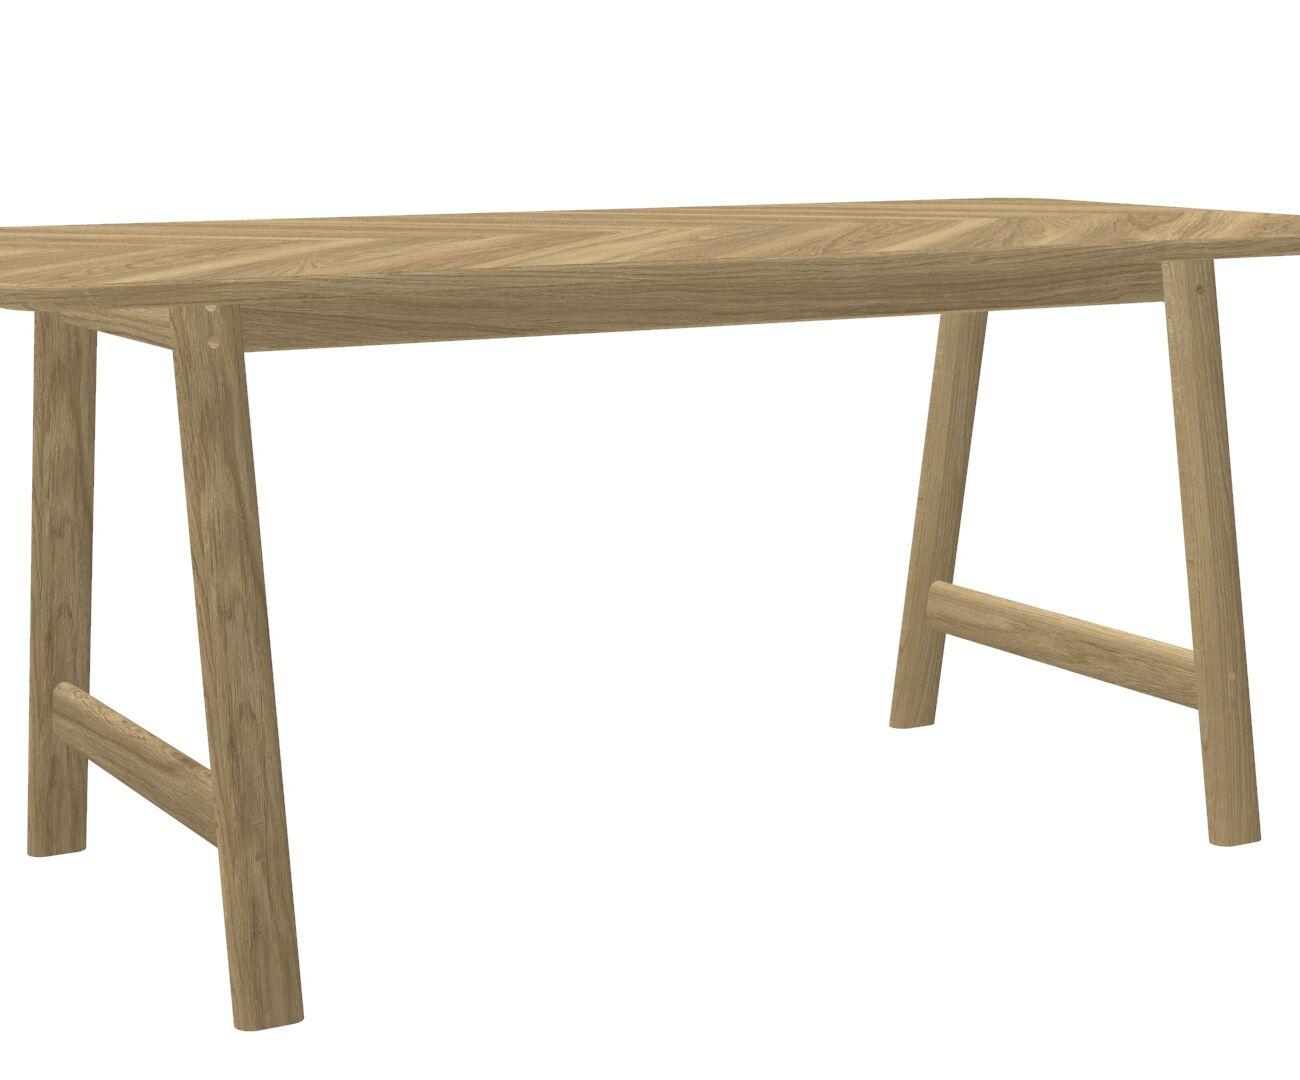 The Contemporary Juno Table with A Chevron Veneer Grain Top